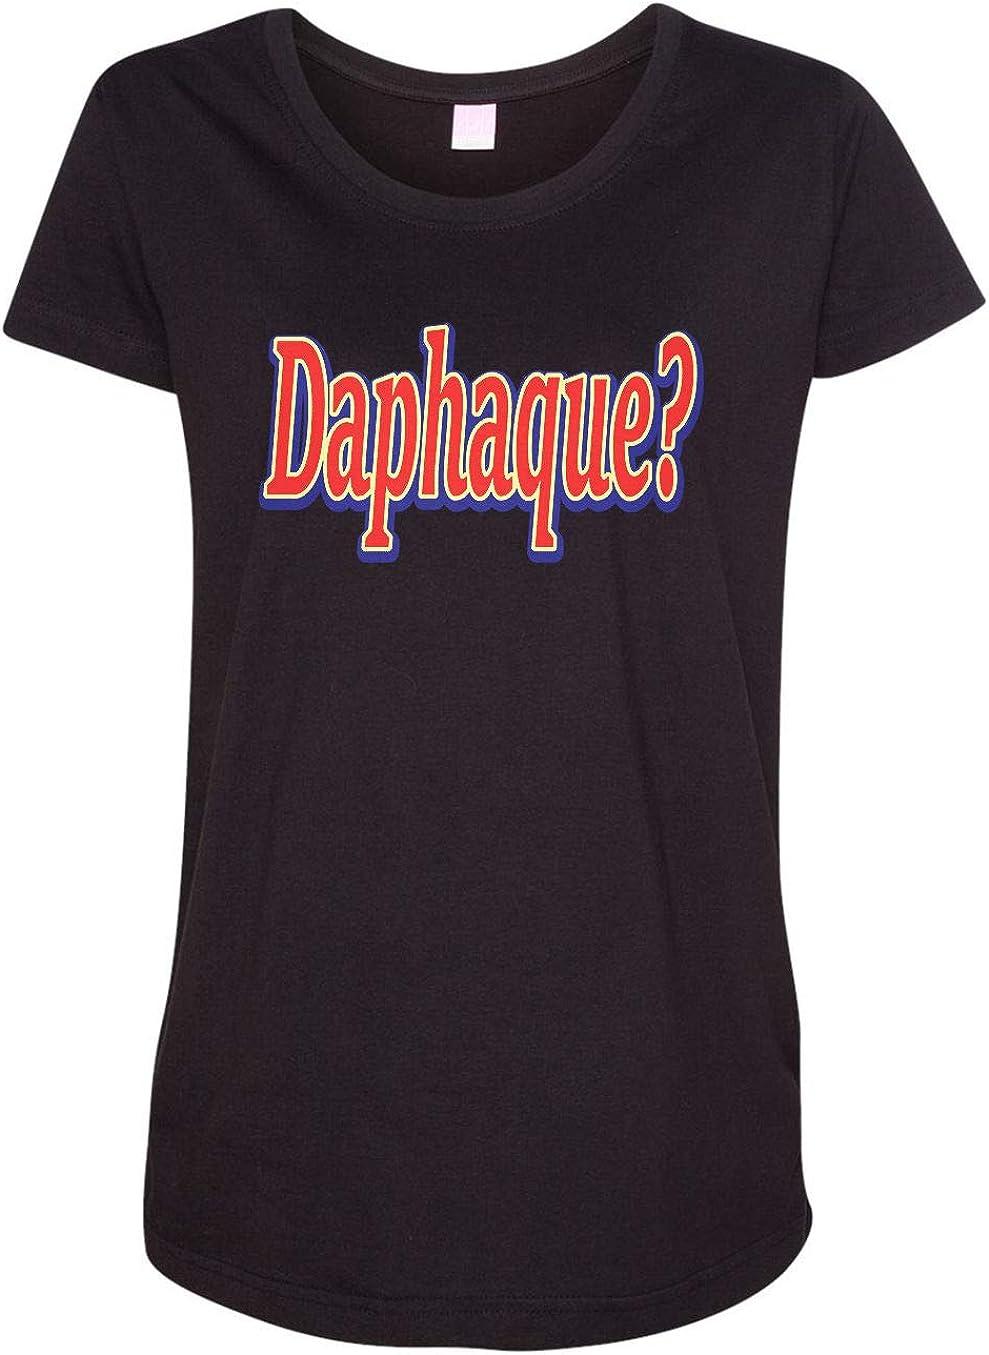 HARD EDGE Direct Popular standard sale of manufacturer DESIGN Daphaque T-Shirt Women's